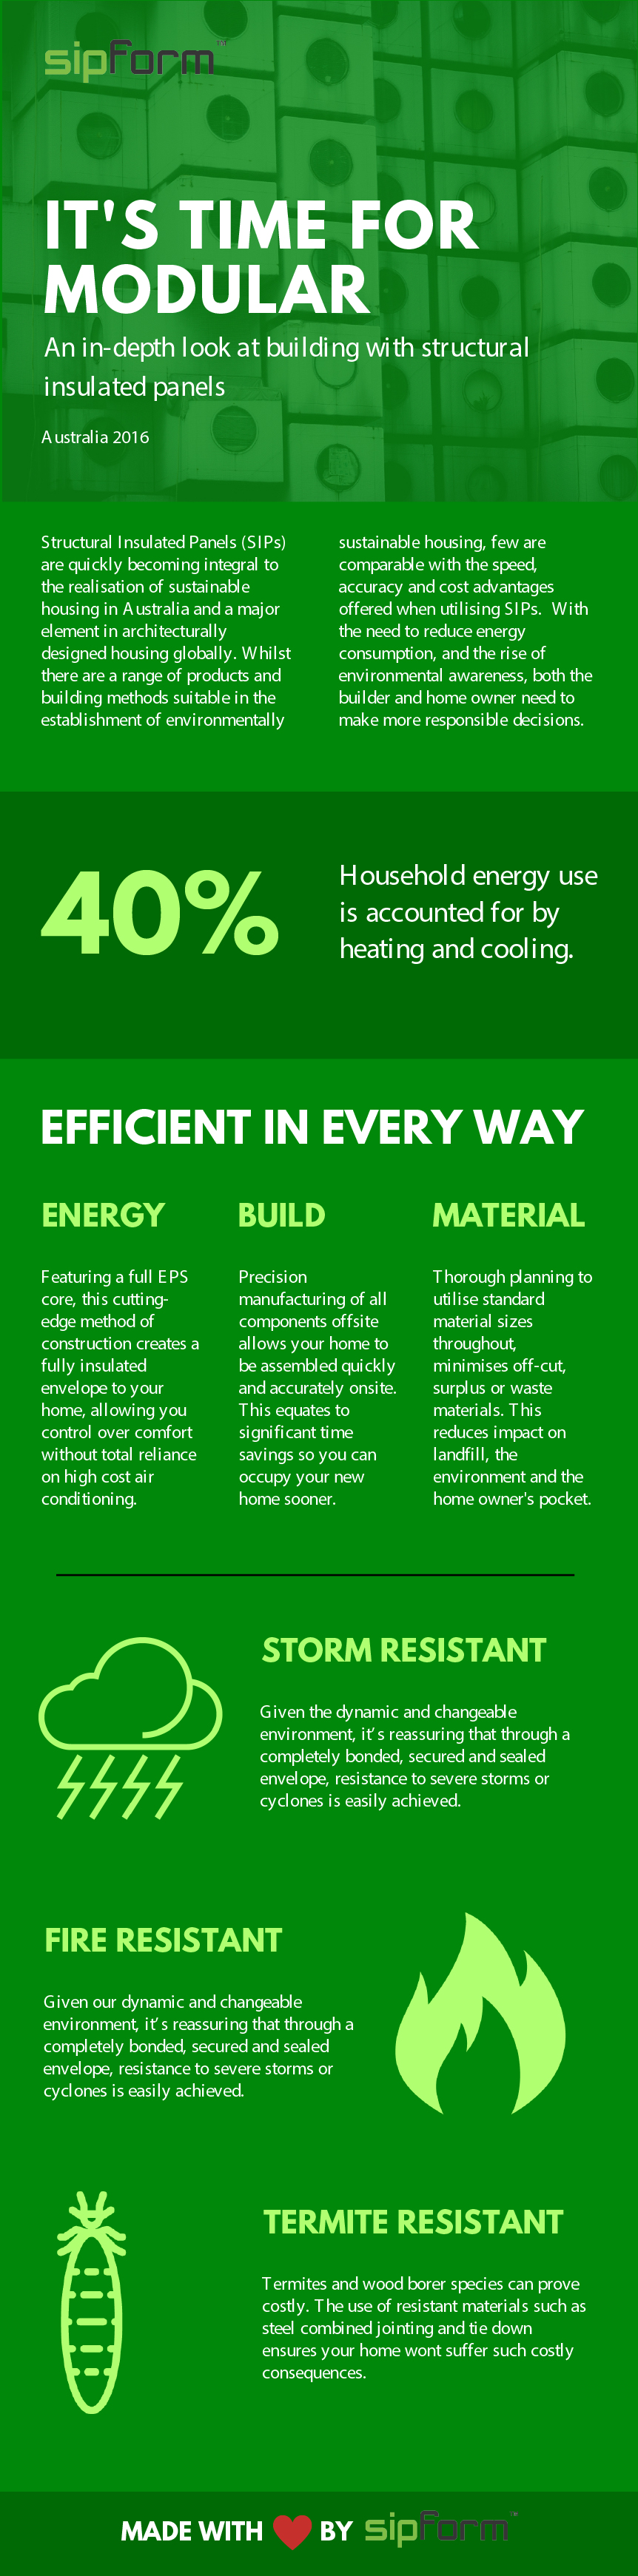 Modular Building Infographic